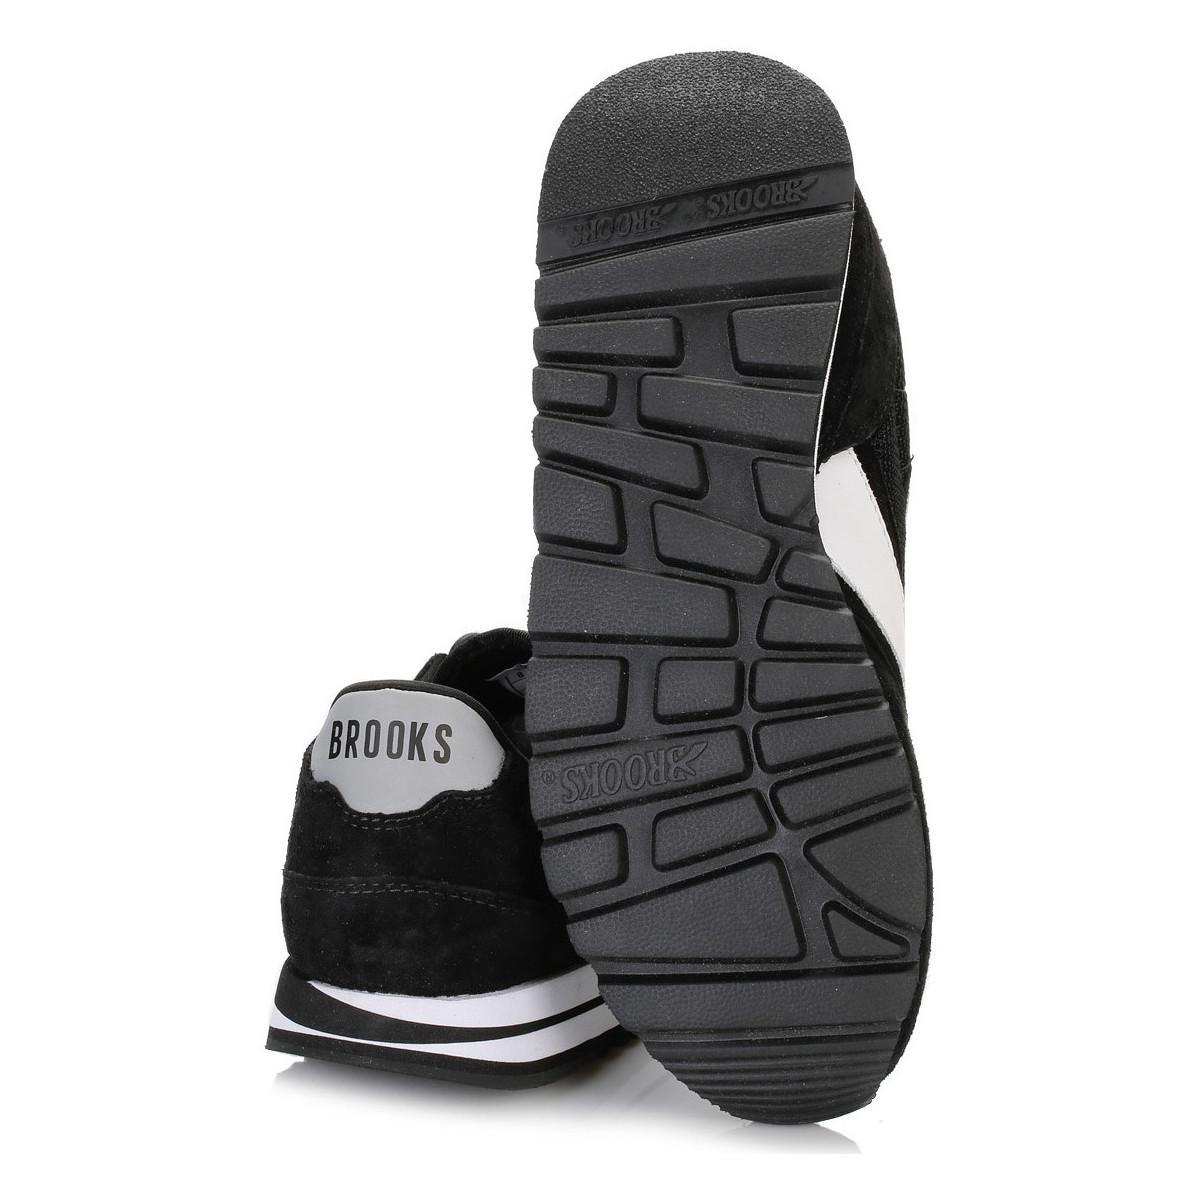 dccbd81b5f74e Brooks Mens Jet Black white Chariot Trainers Men s Shoes (trainers ...